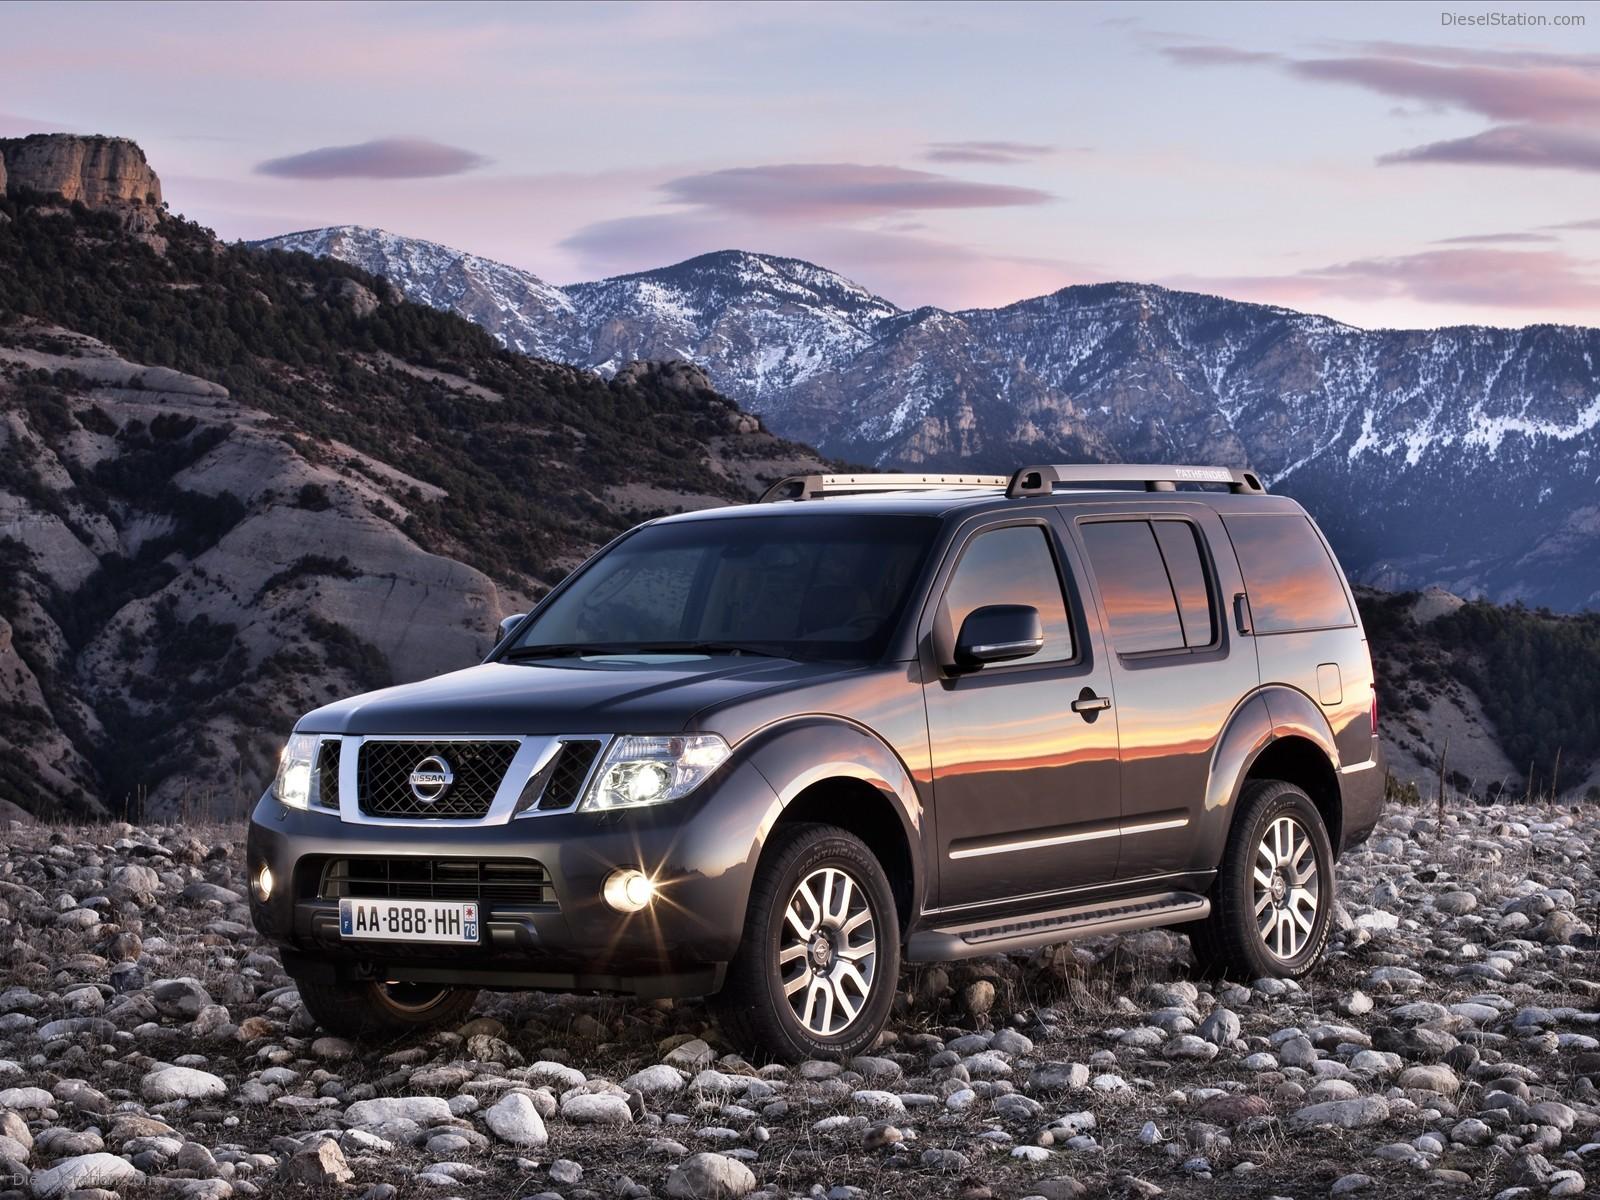 Nissan Pathfinder Pictures Wallpaper 65984 1600x1200px 1600x1200